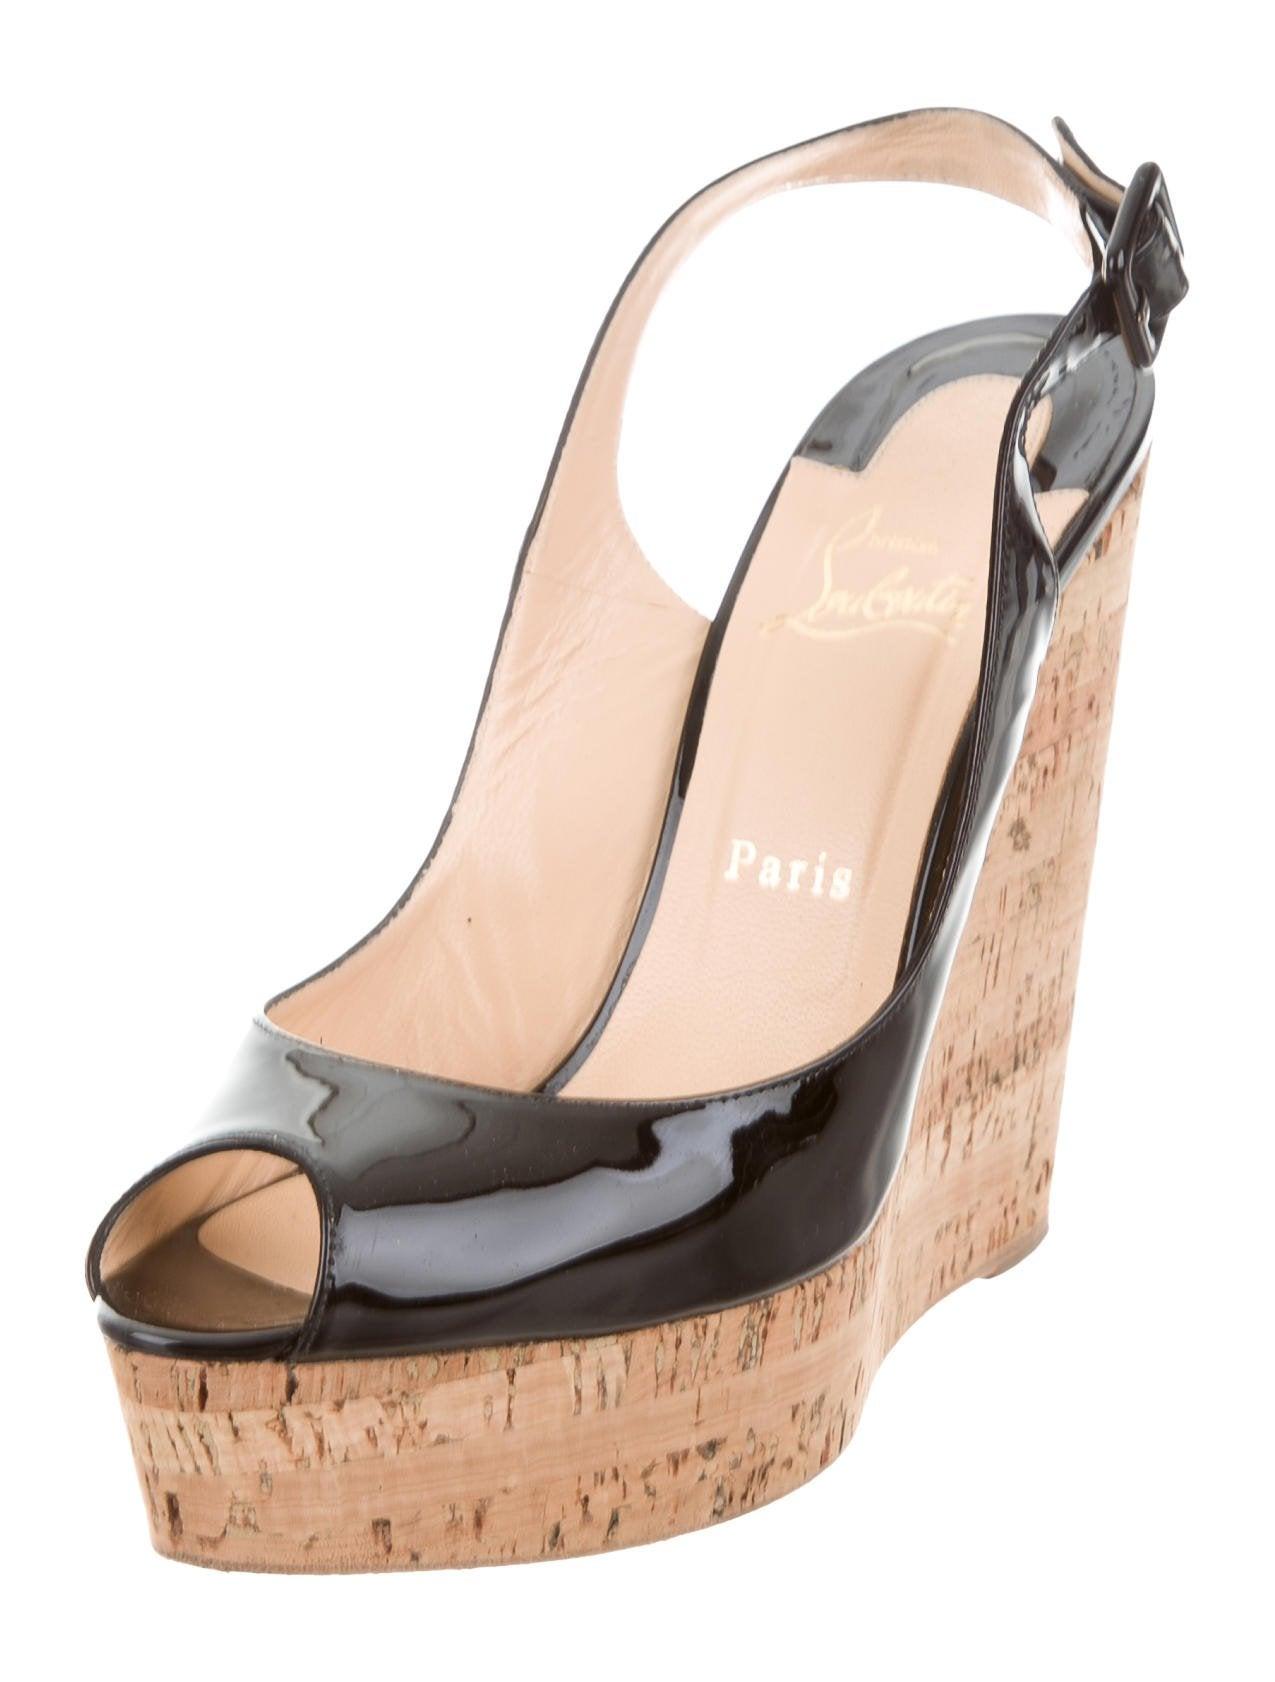 wholesale dealer aead6 6bcf2 Christian Louboutin Une Plume Slingback Wedges - Shoes ...